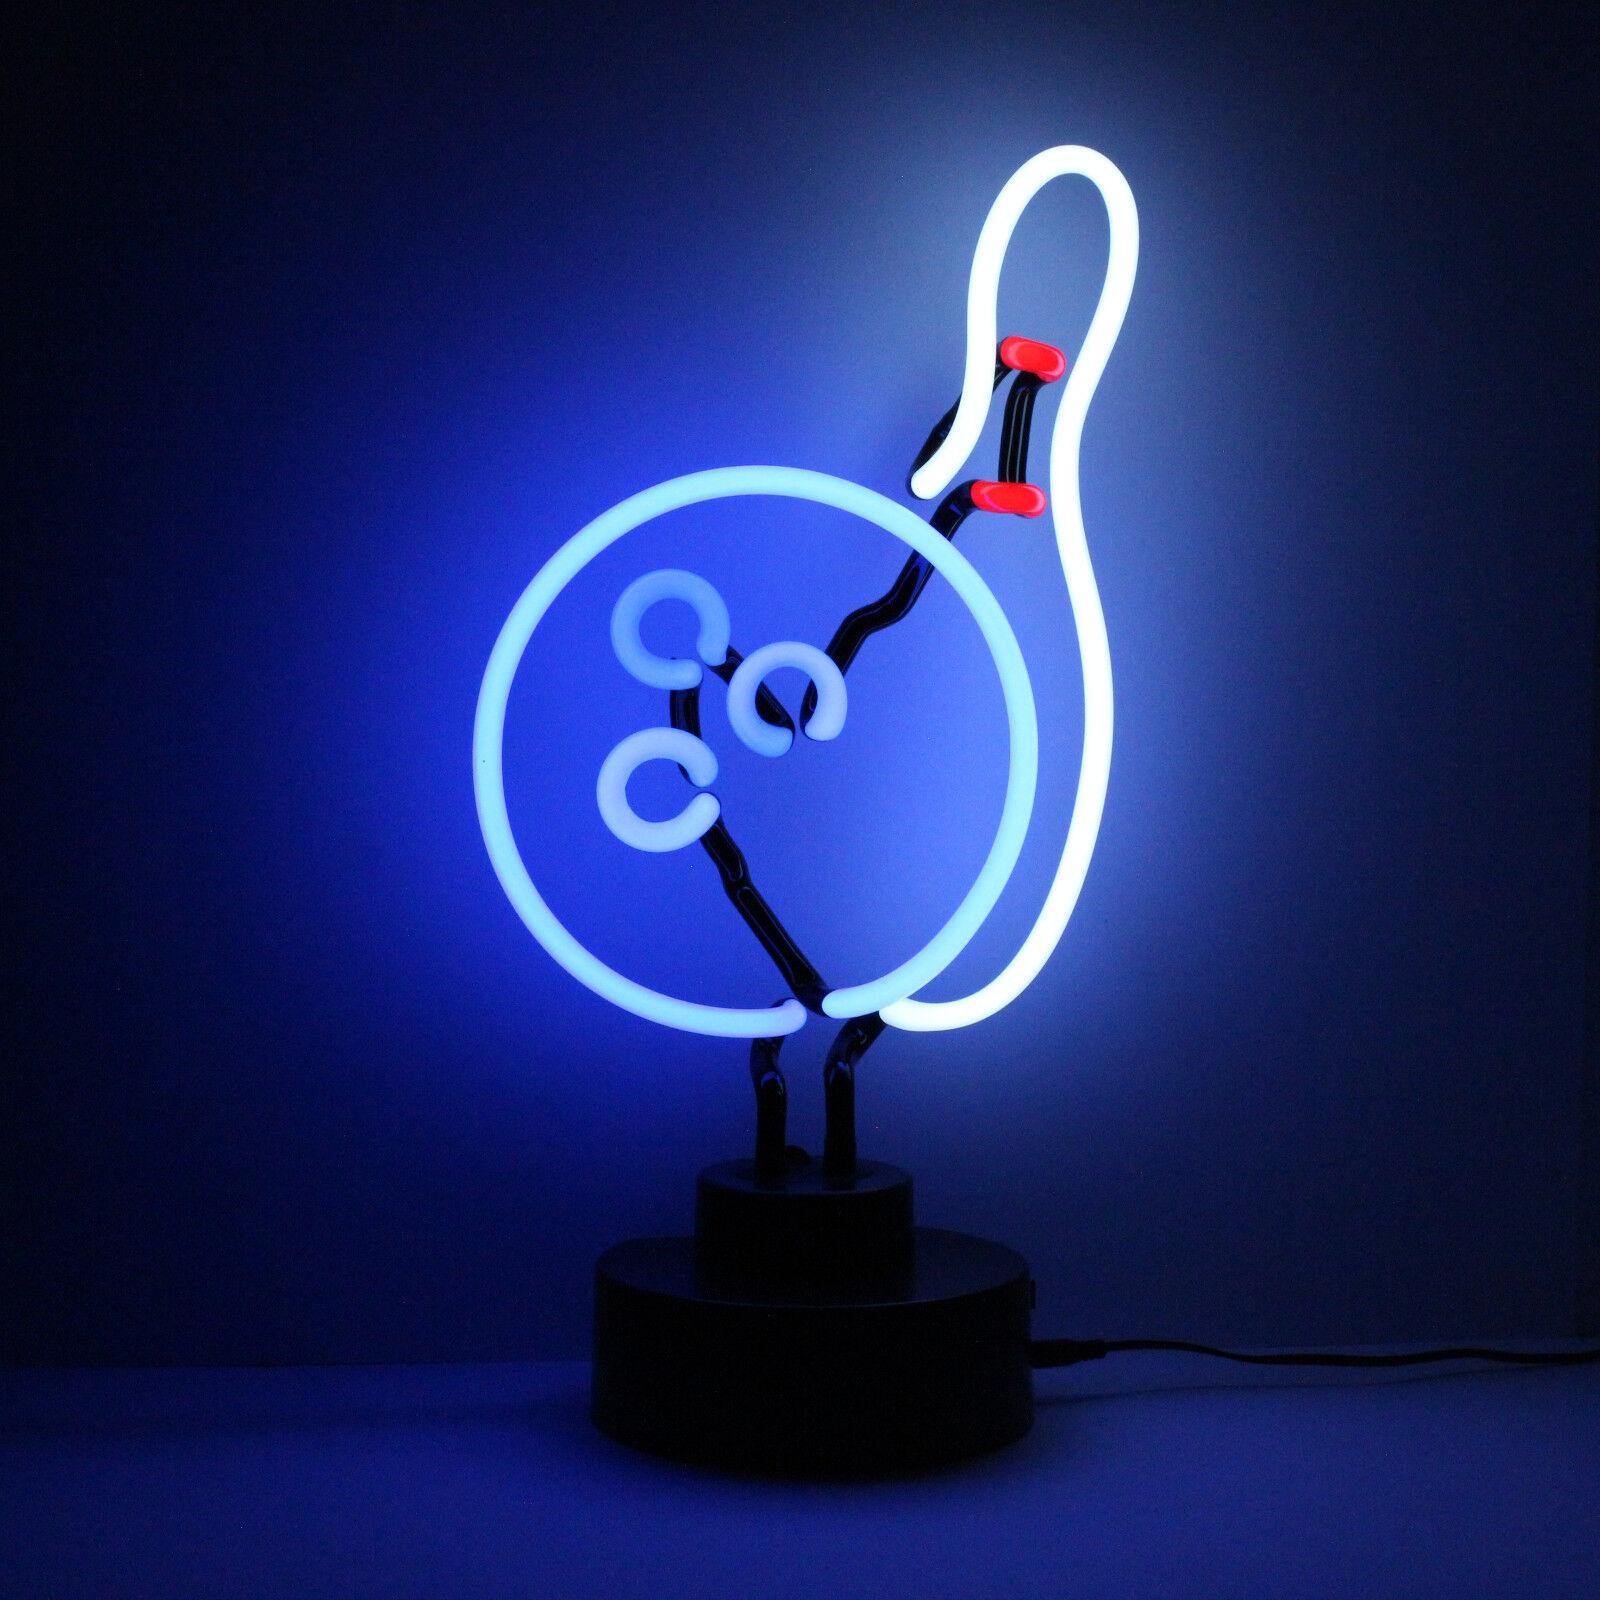 Neon BOWLING PIN and BALL Light Sculpture Table Shelf Reading Lamp Neonetics UK